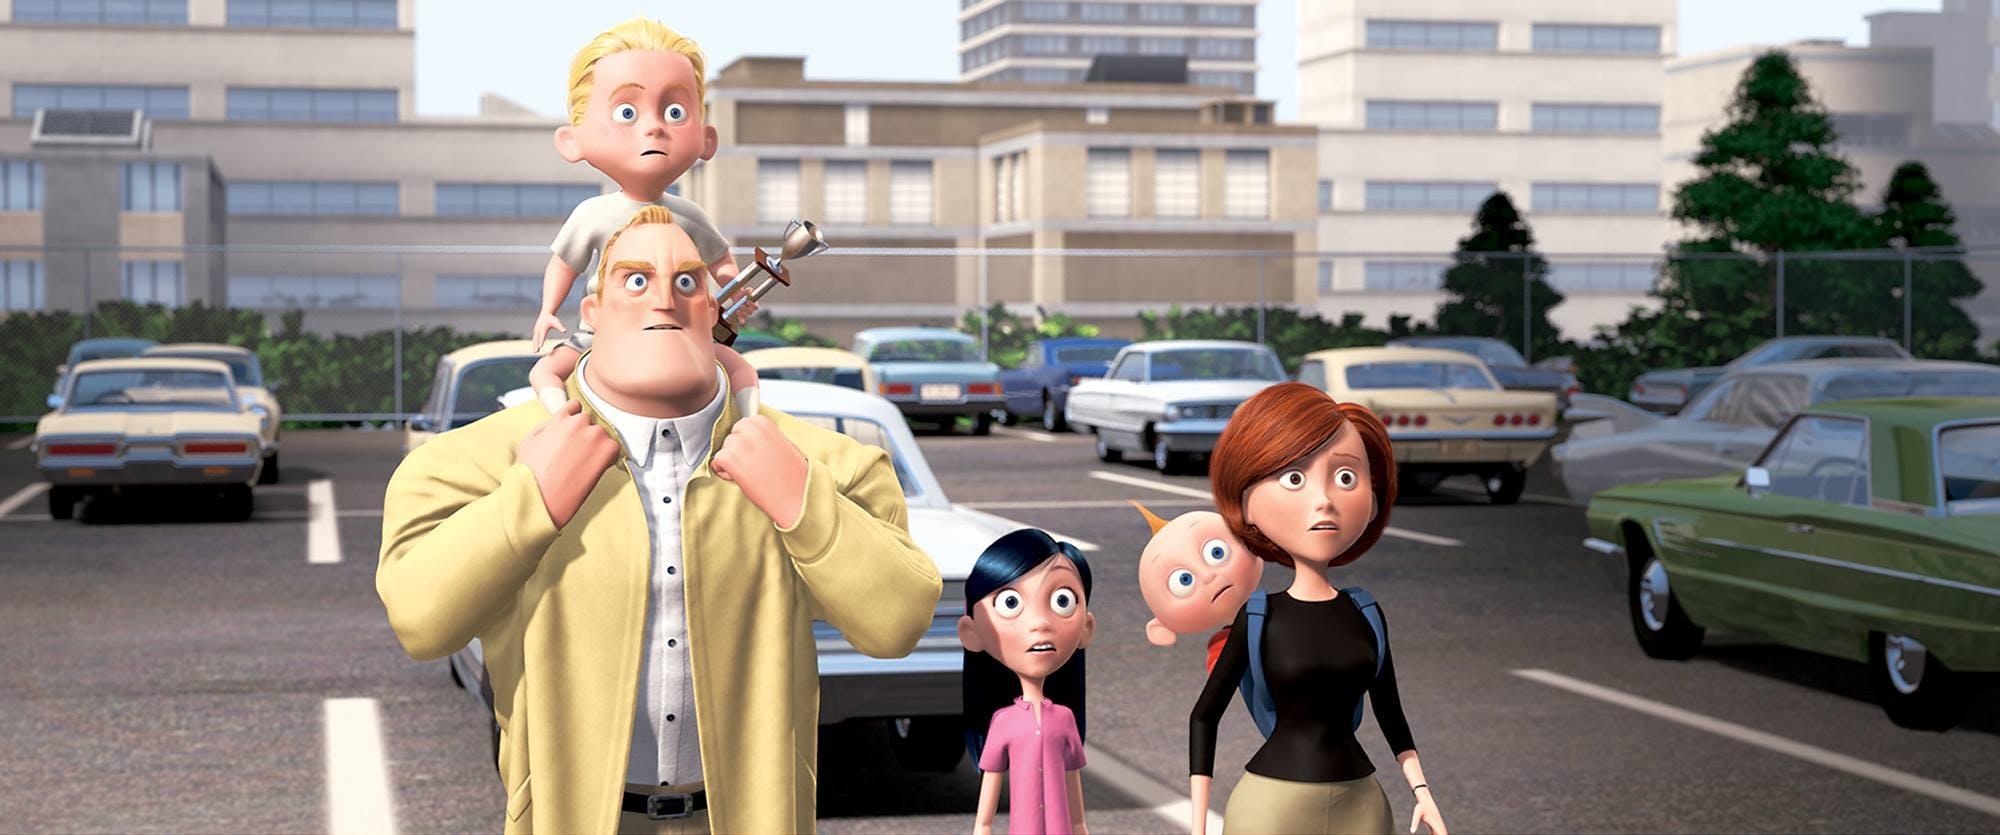 pixar company : the incredibles